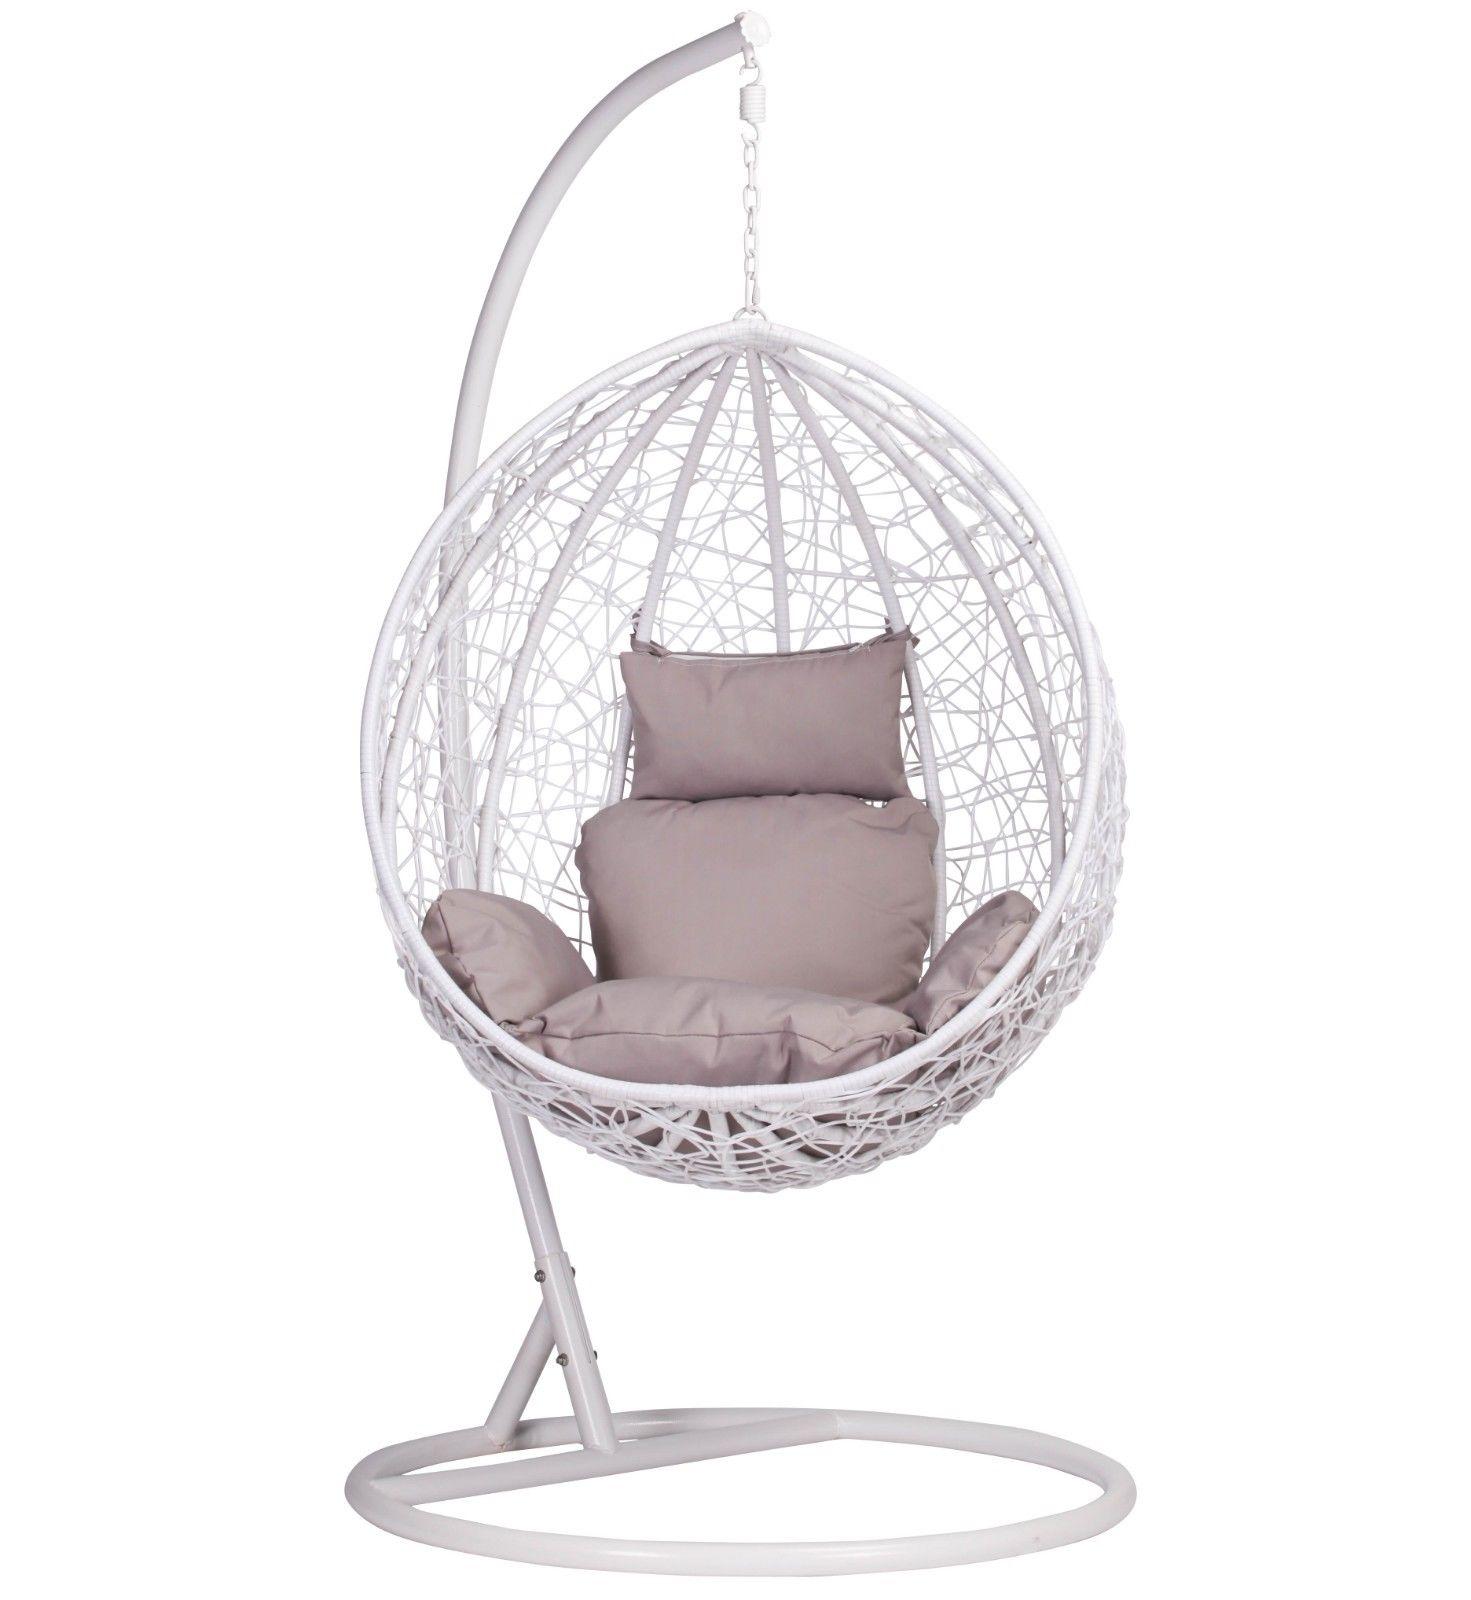 White Rattan Swing Weave Patio Garden Hanging Egg Chair